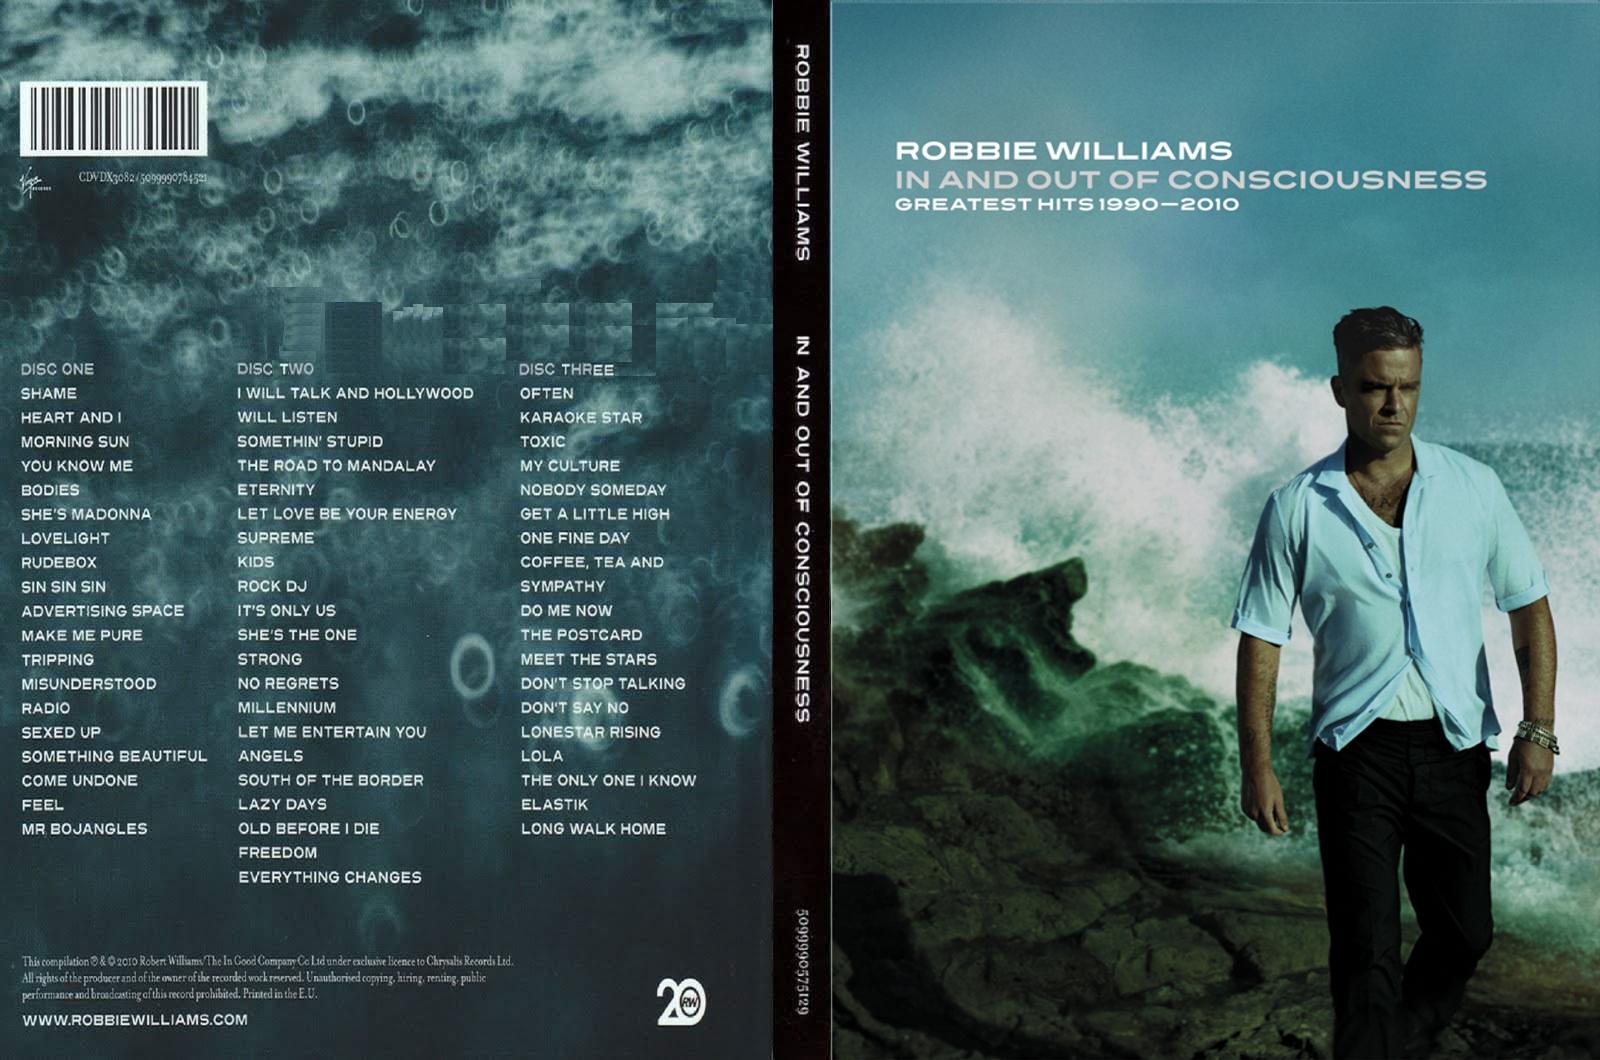 http://4.bp.blogspot.com/-MBZDbZnt7AI/UIzKqFVvpkI/AAAAAAAAI7k/Y9Uj4cZyv-s/s1600/Robbie+Williams+-+In+And+Out+Of+Consciousness+Greatest+Hits+1990+-+2010.jpg